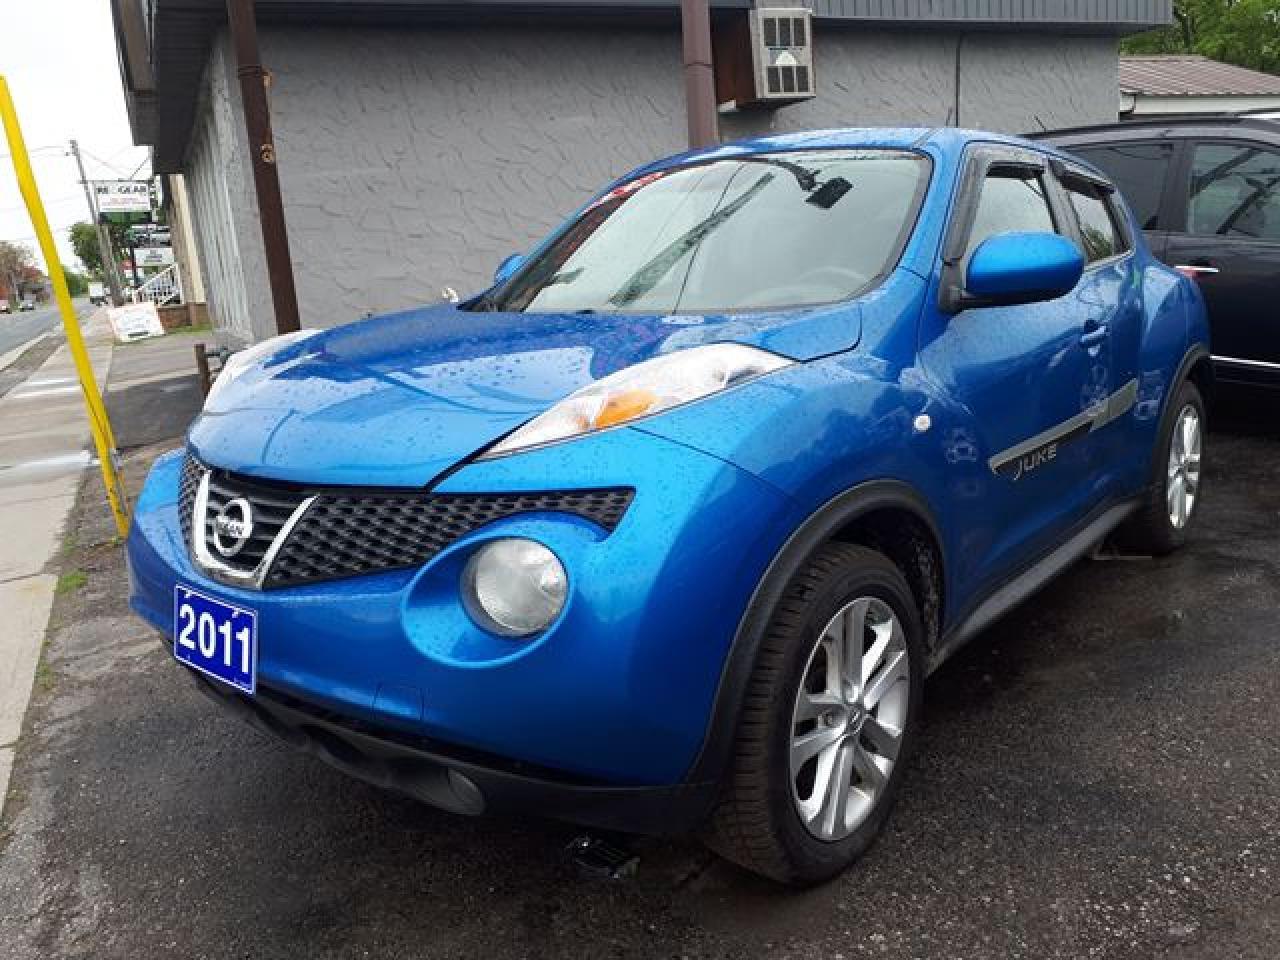 Photo of Blue 2011 Nissan Juke